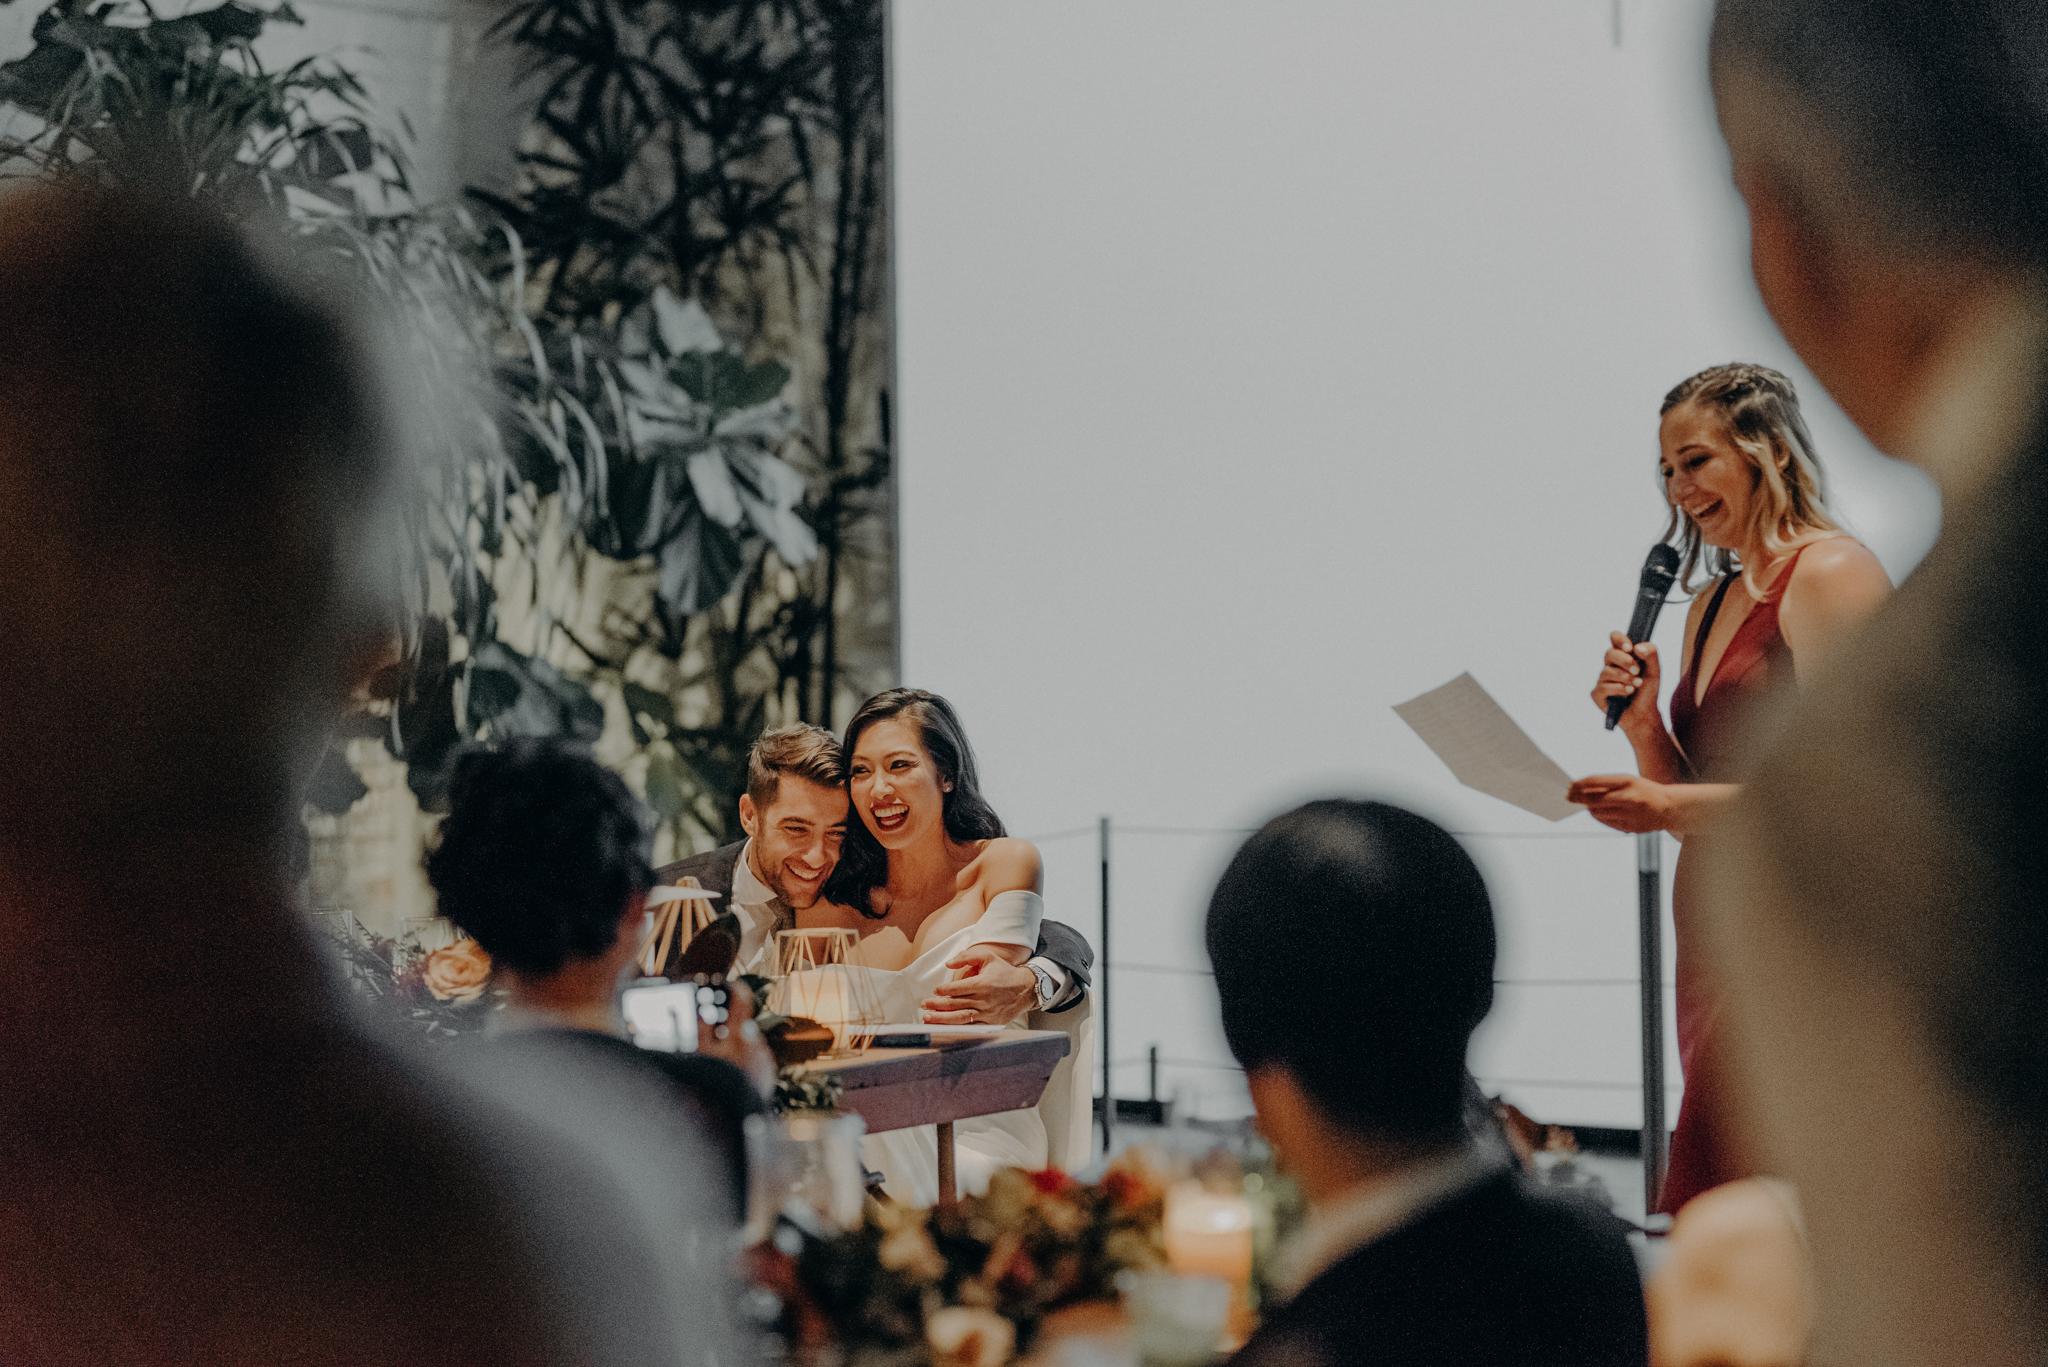 Wedding Photo LA - wedding photographer in los angeles - millwick wedding venue -isaiahandtaylor.com-126.jpg